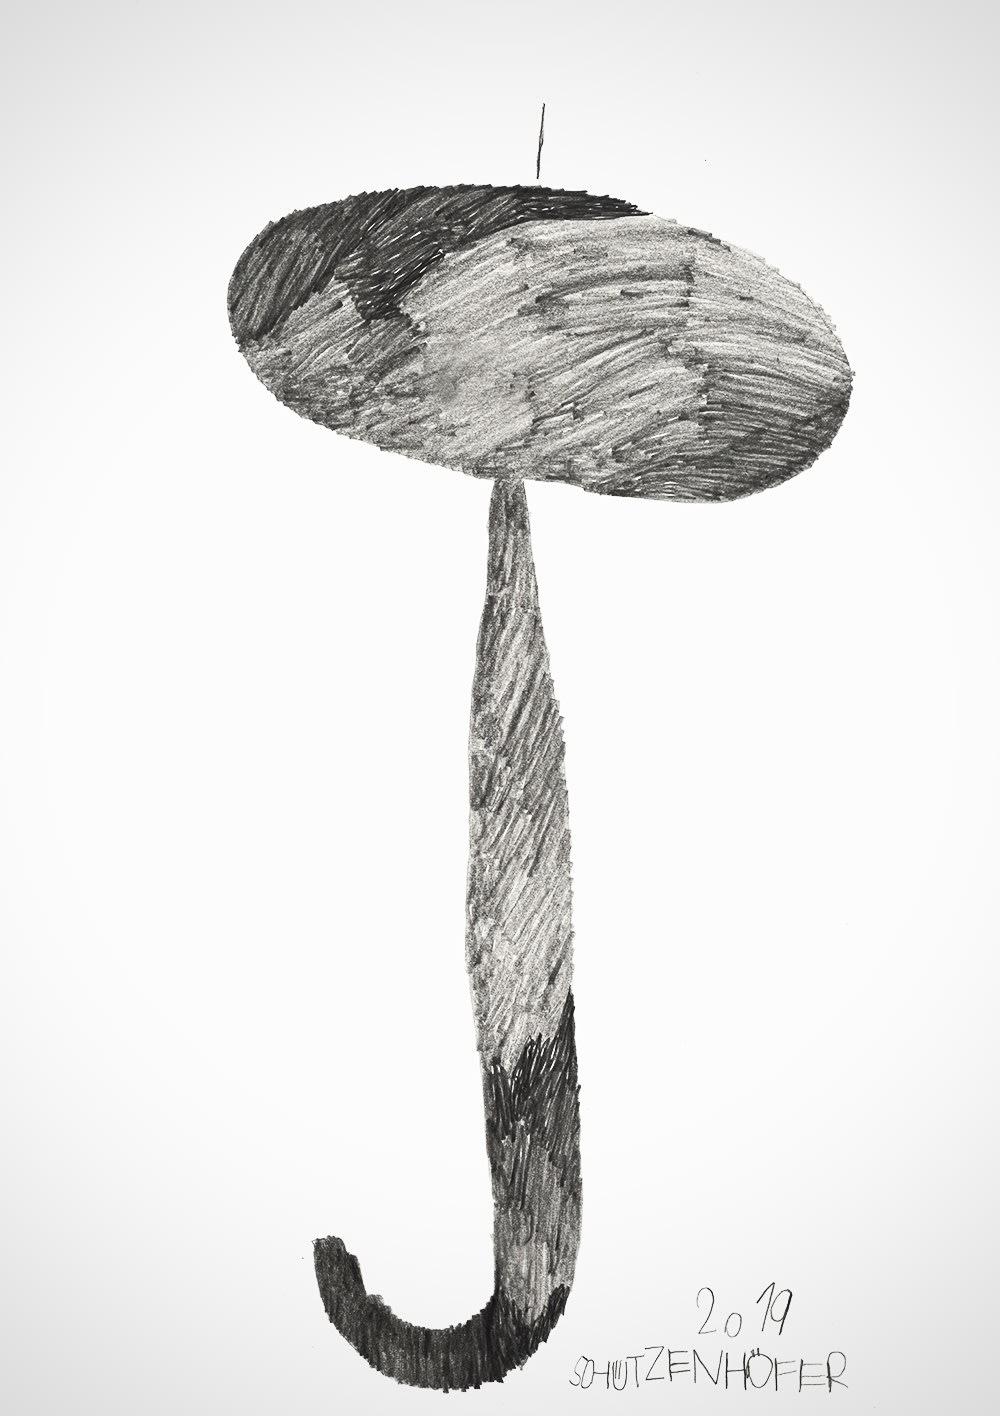 Sunshade, 2019 Graphite on paper 27.5 x 19.8 in. (70 x 50 cm.) (GSG 116) $7,000